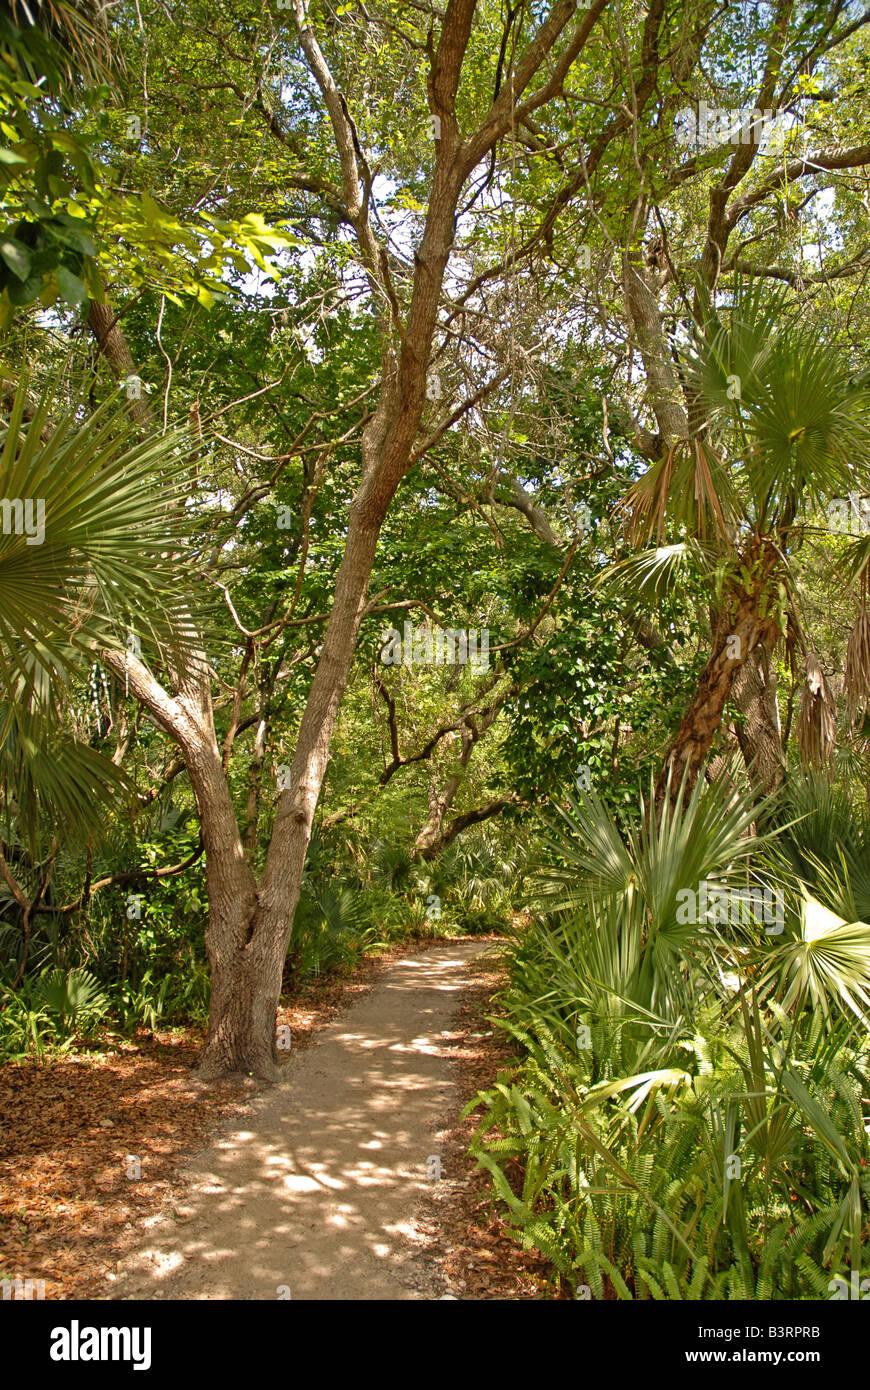 Florida hiking trail florida hikes Gold Head Branch State Park fl fla - Stock Image